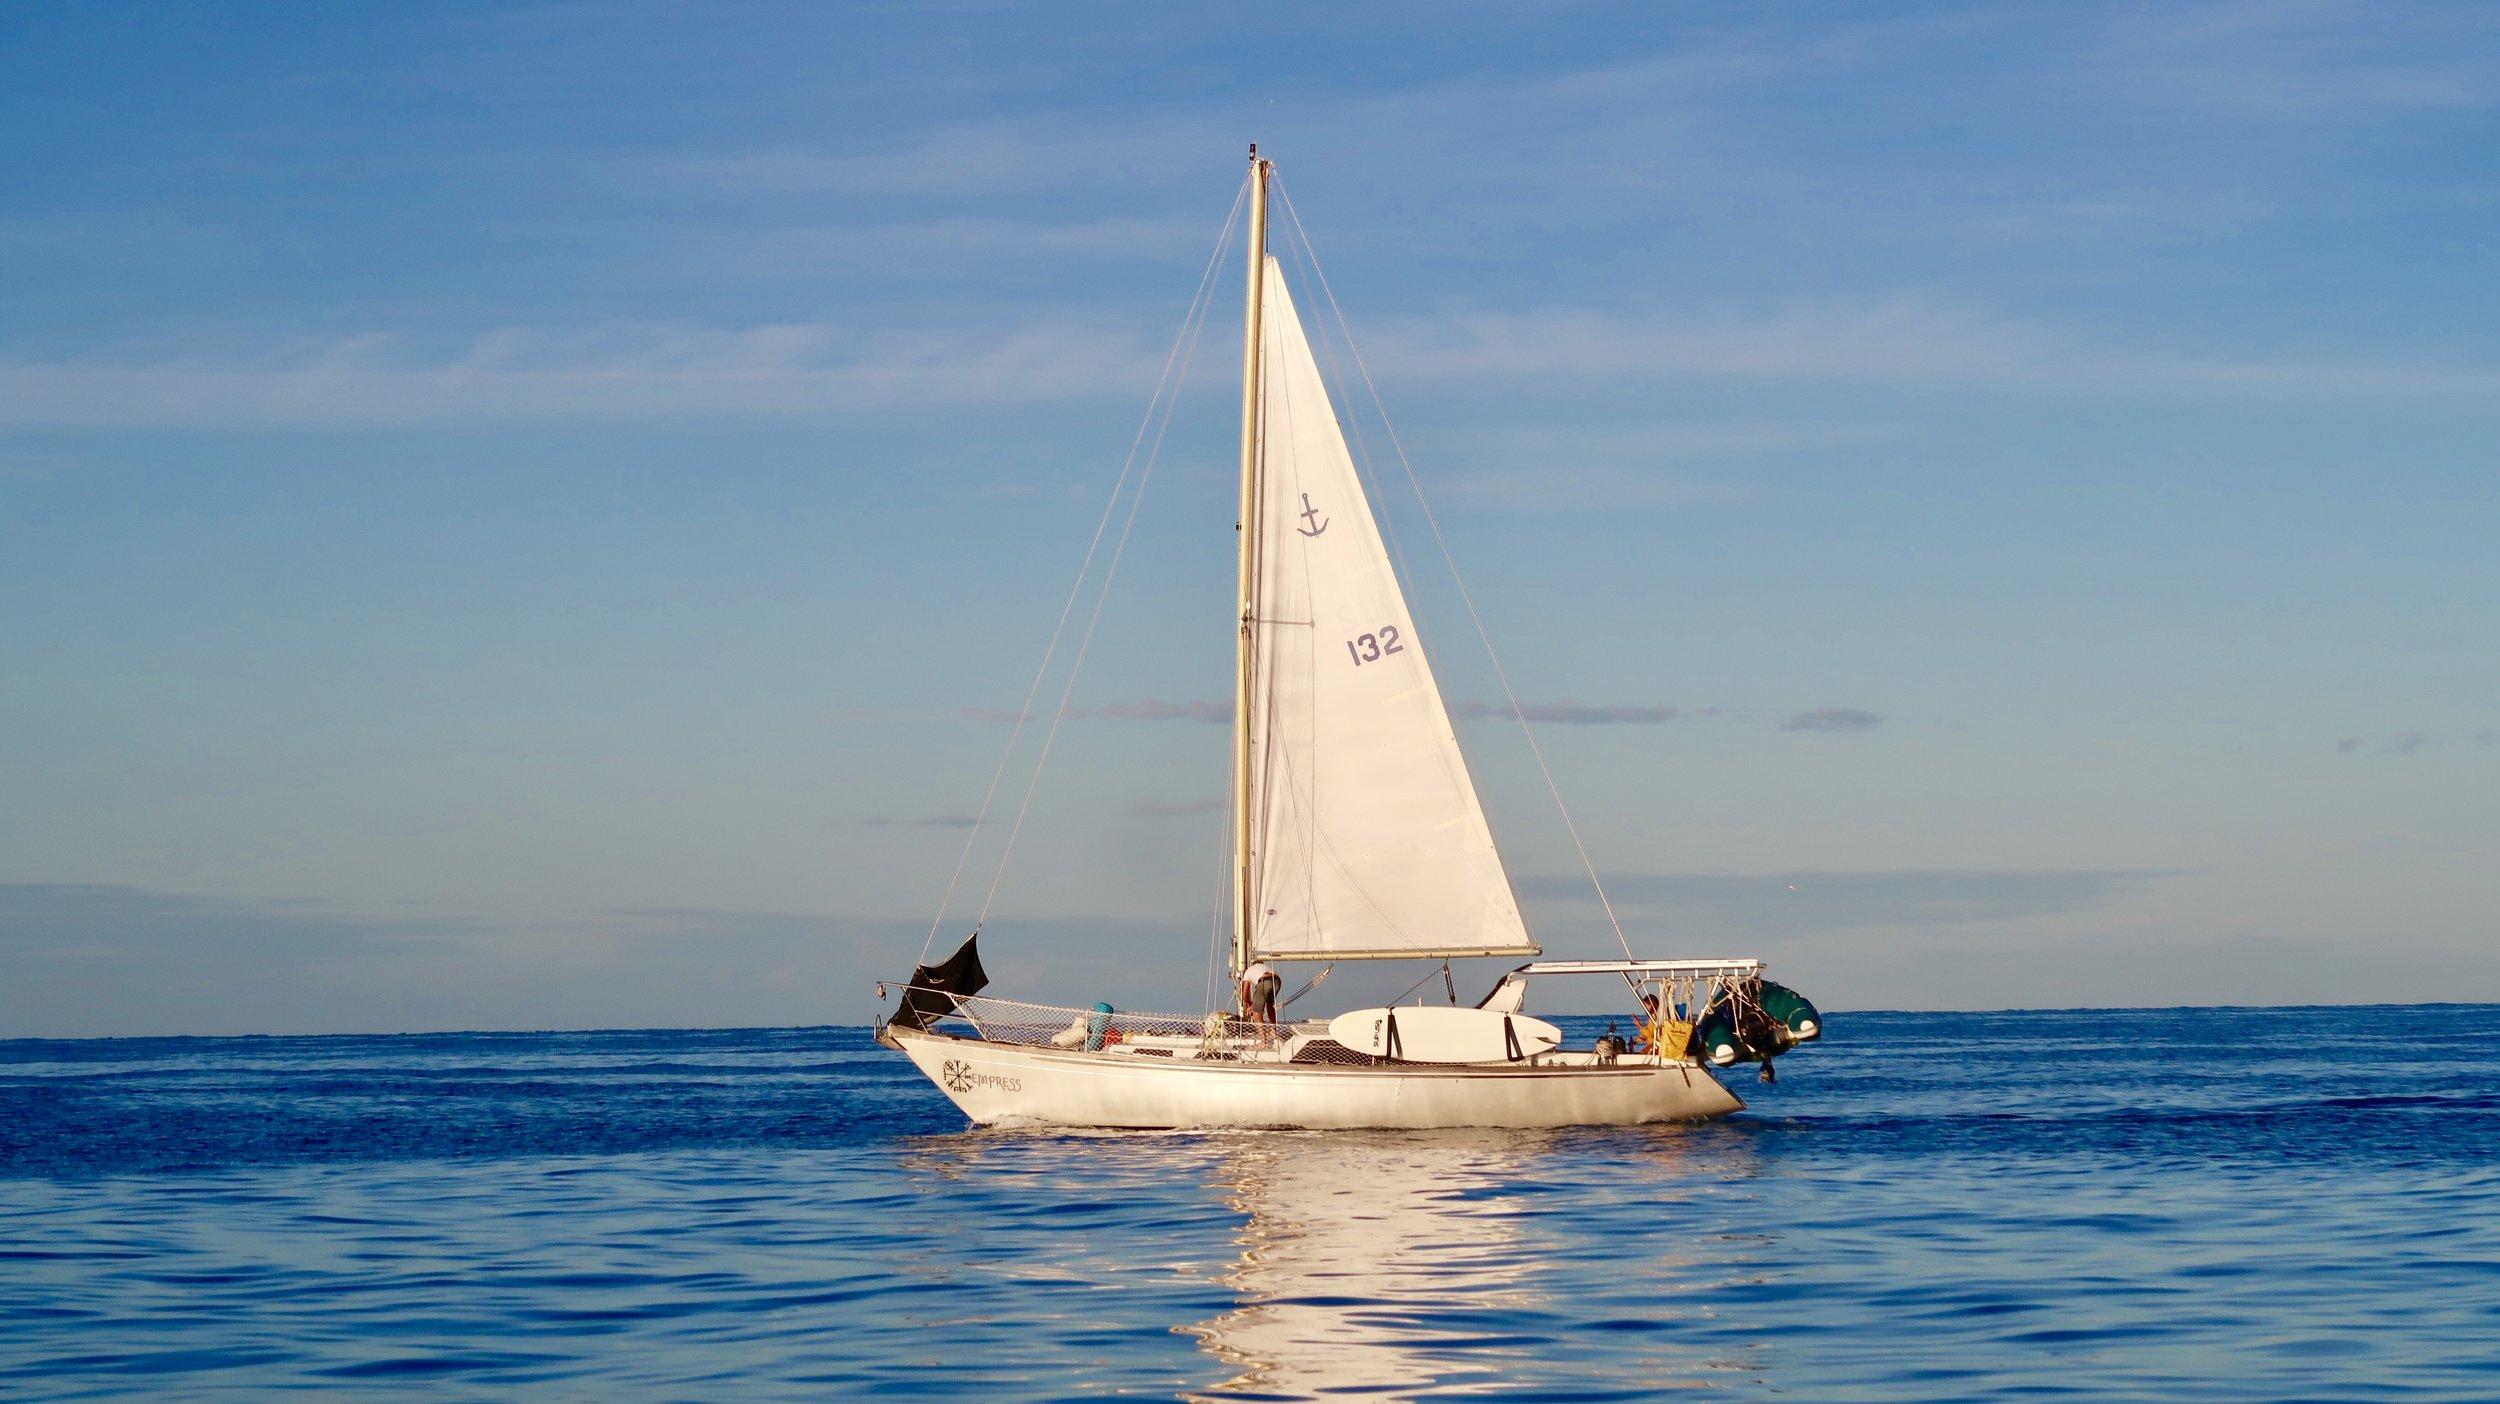 Yachting in Greece - Crewed vs Bareboat.jpeg